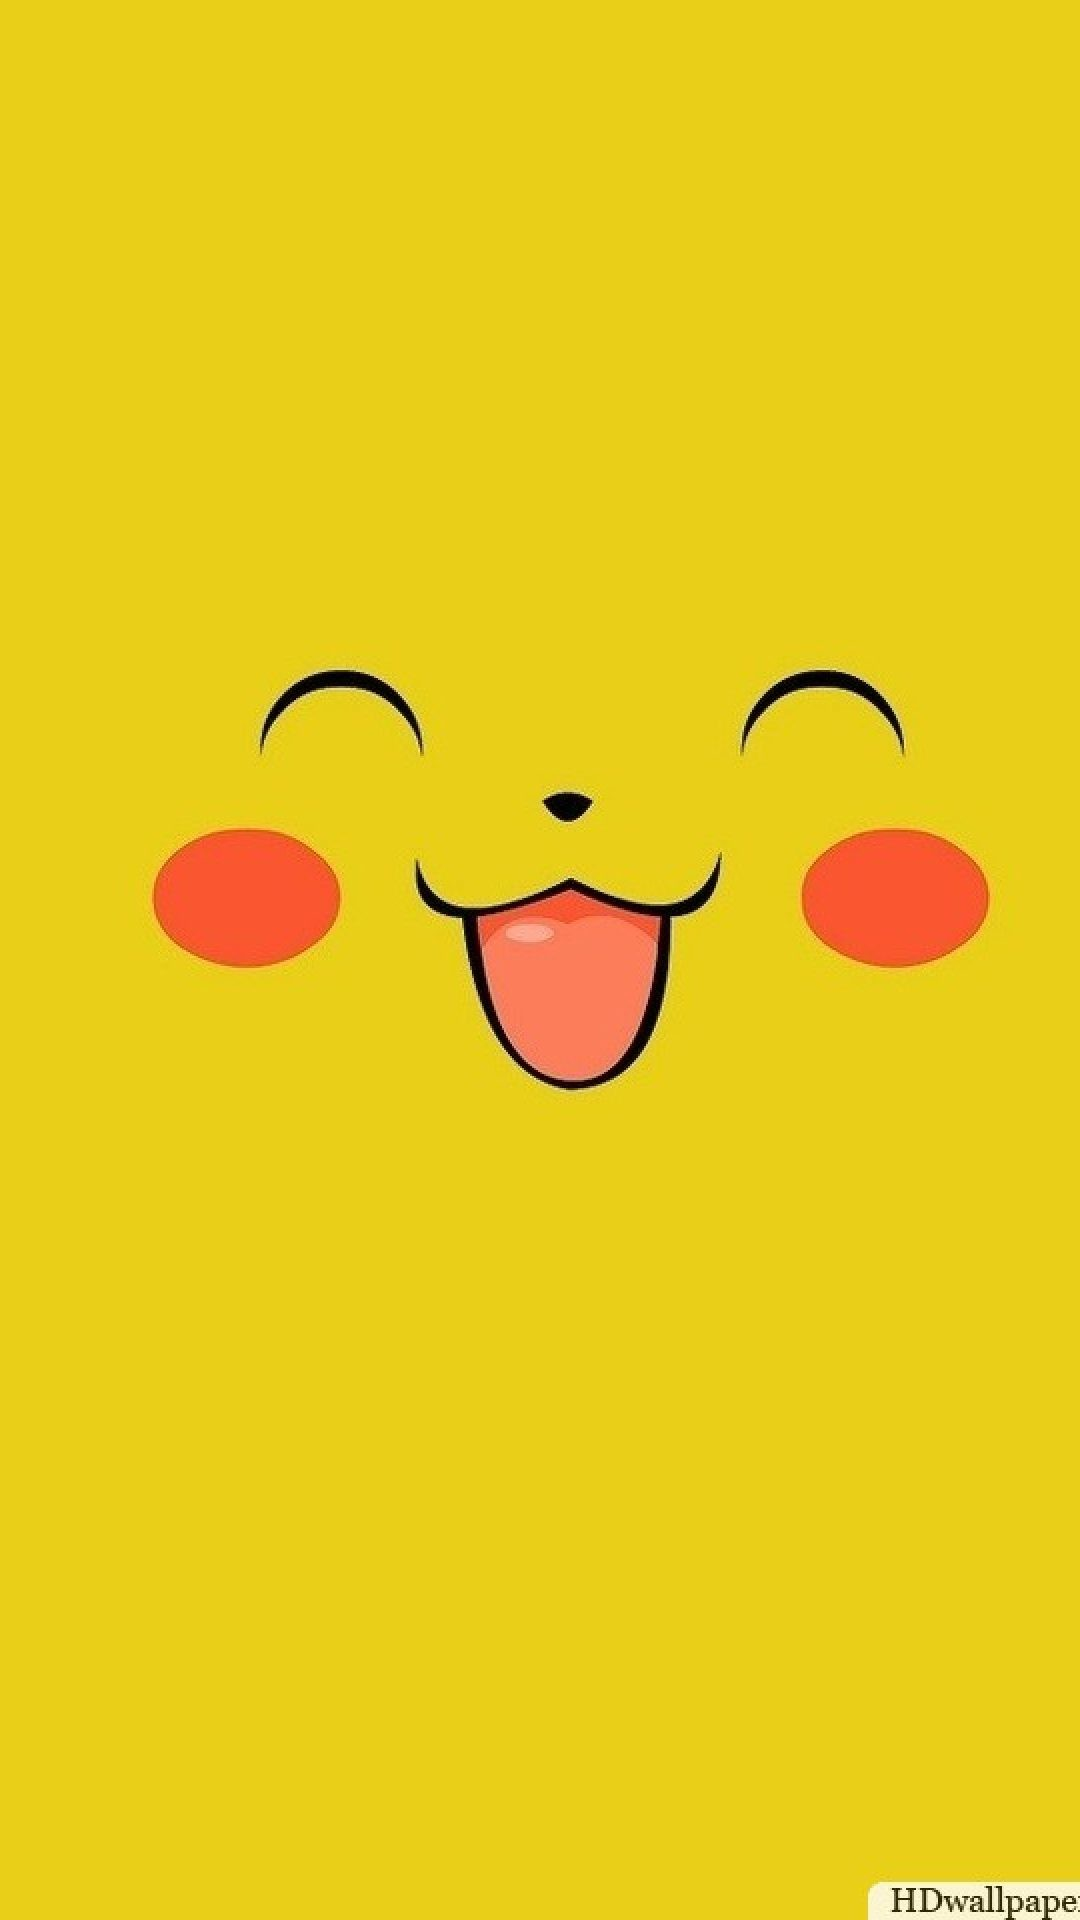 pikachu wallpaper phone